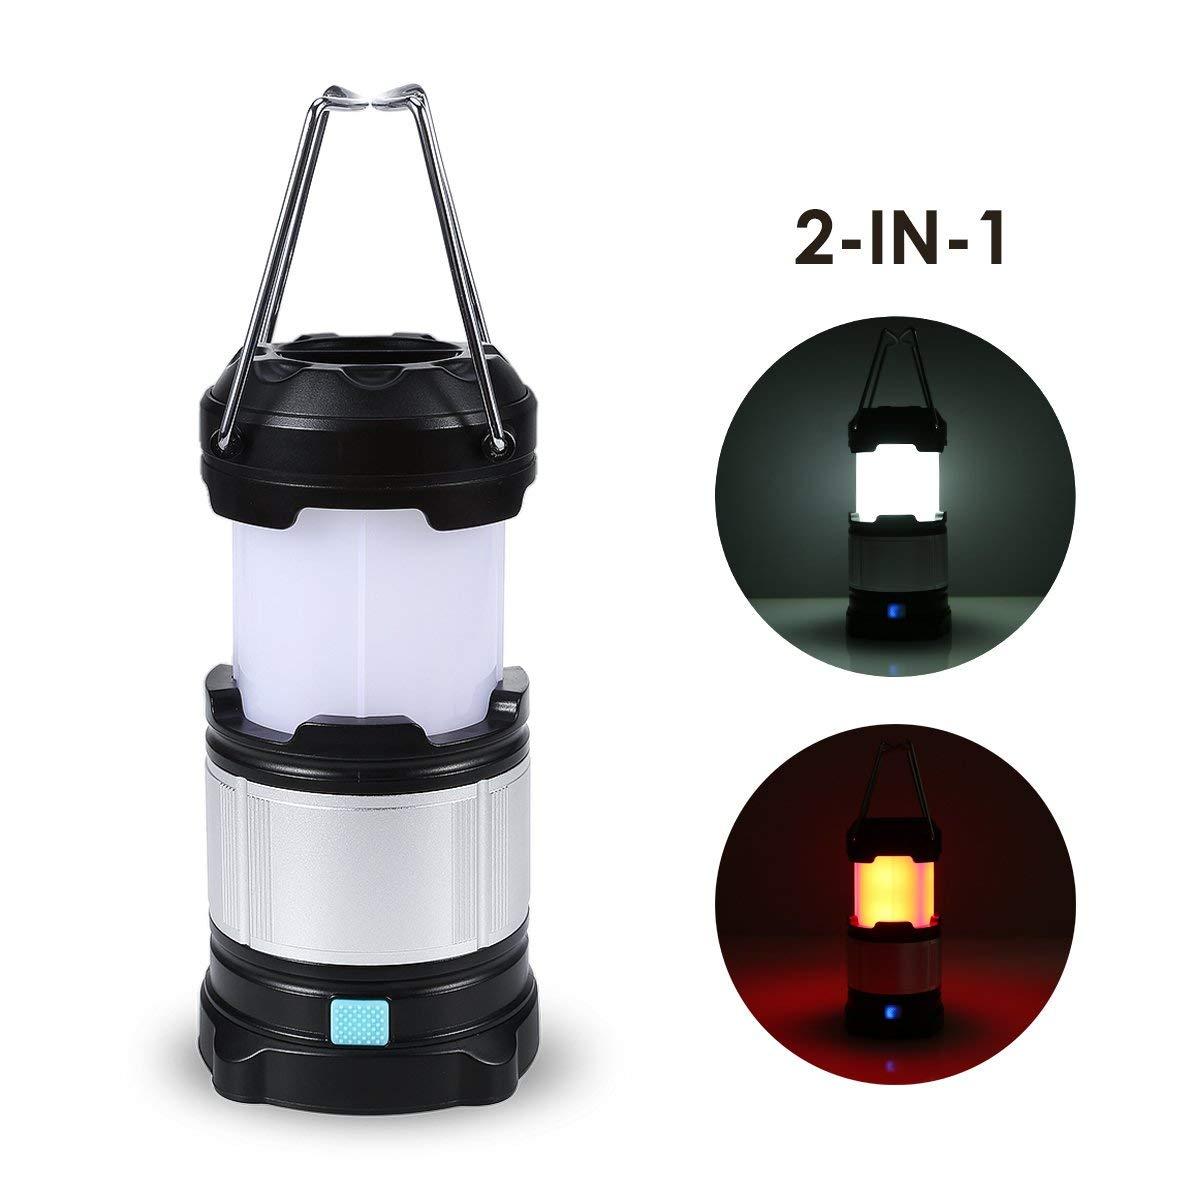 Bild zu [Prime] TryLight LED-Campinglampe mit 4000 mAh Power Bank für 12,99€